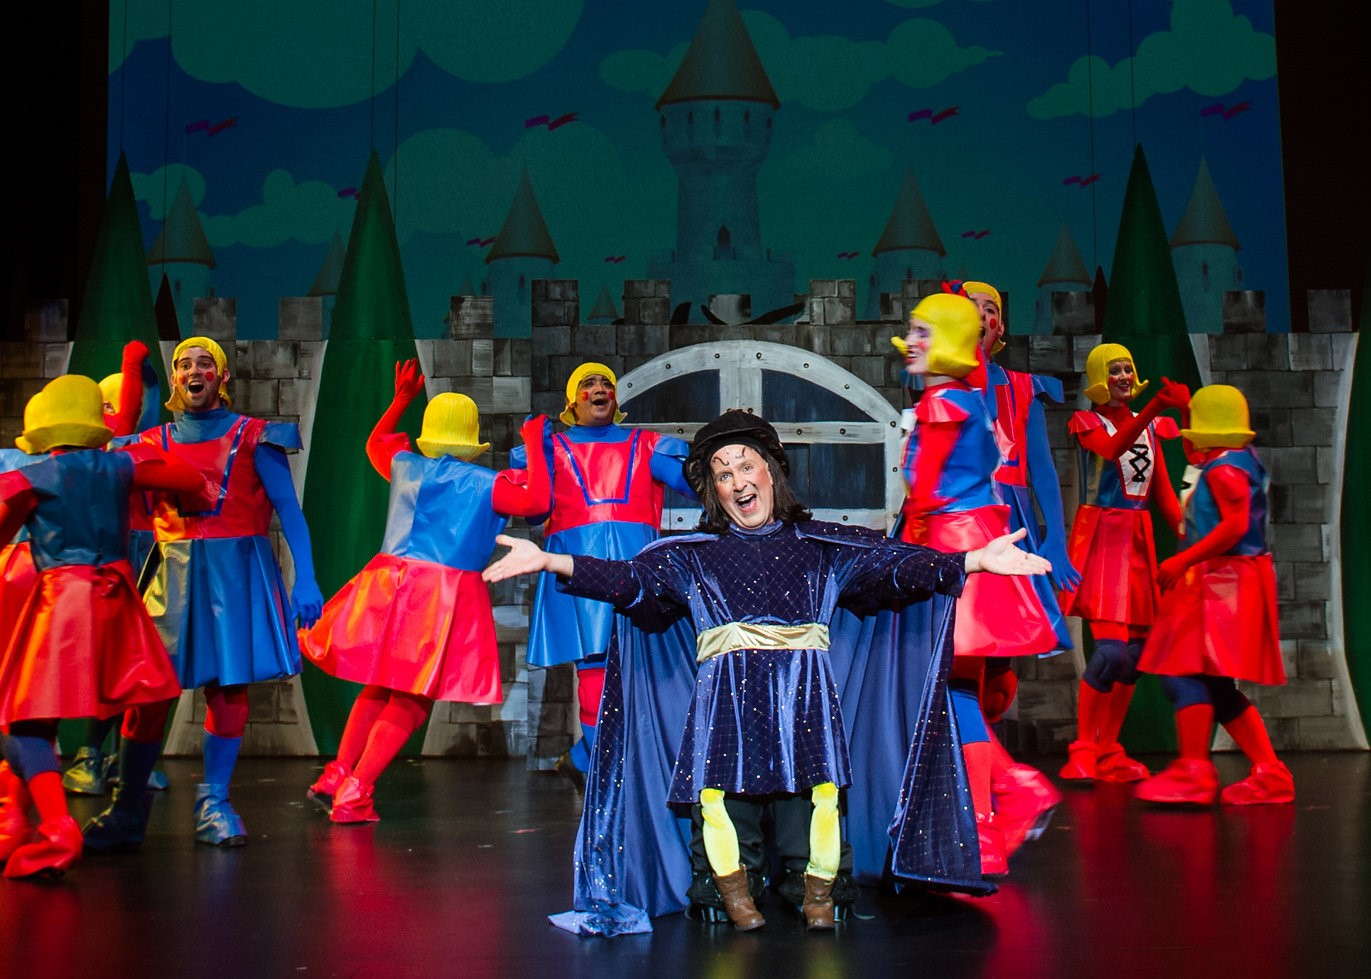 Chuck Dluhy as Farquaad with the Duloc Dancers. Photo by Traci J. Brooks Studios.